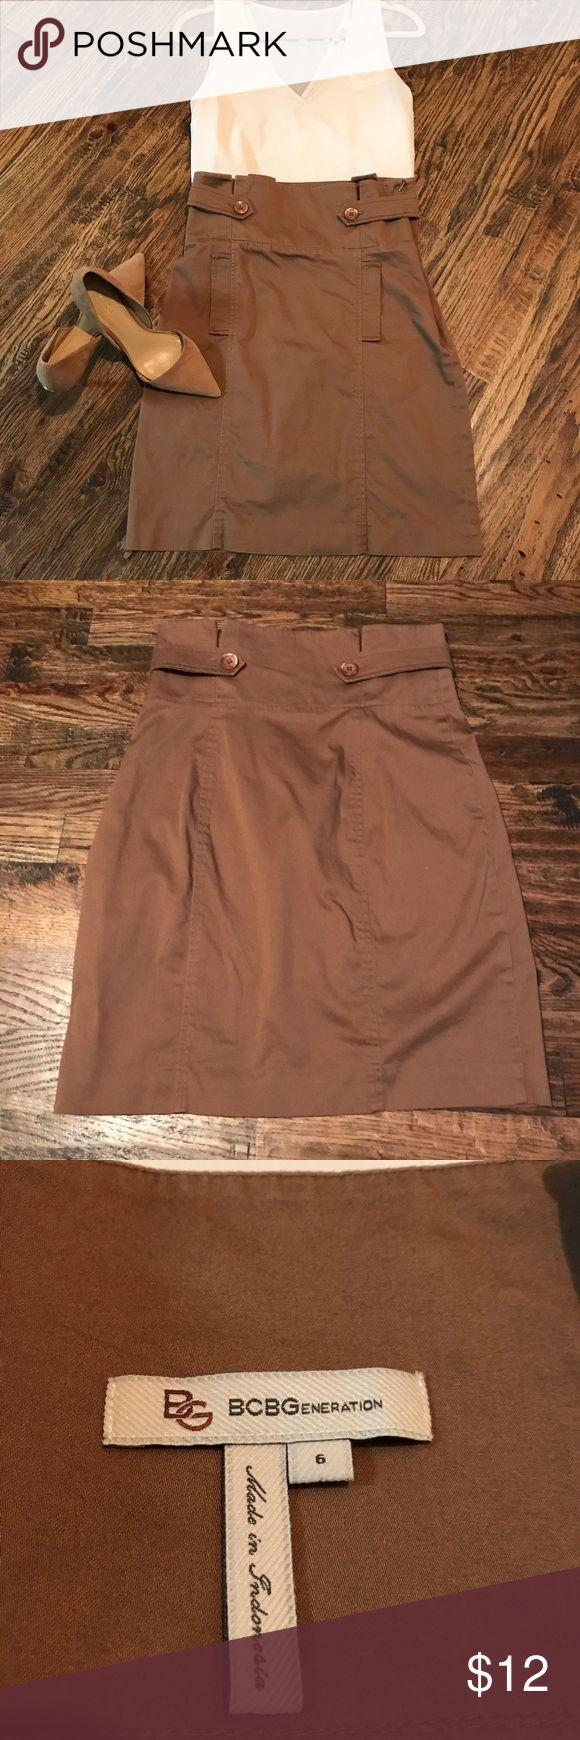 BCBGeneration Pencil Skirt BCBGeneration Brown Pencil Skirt. Size 6. Great Condition   97% Cotton 3% Spandex BCBGeneration Skirts Pencil